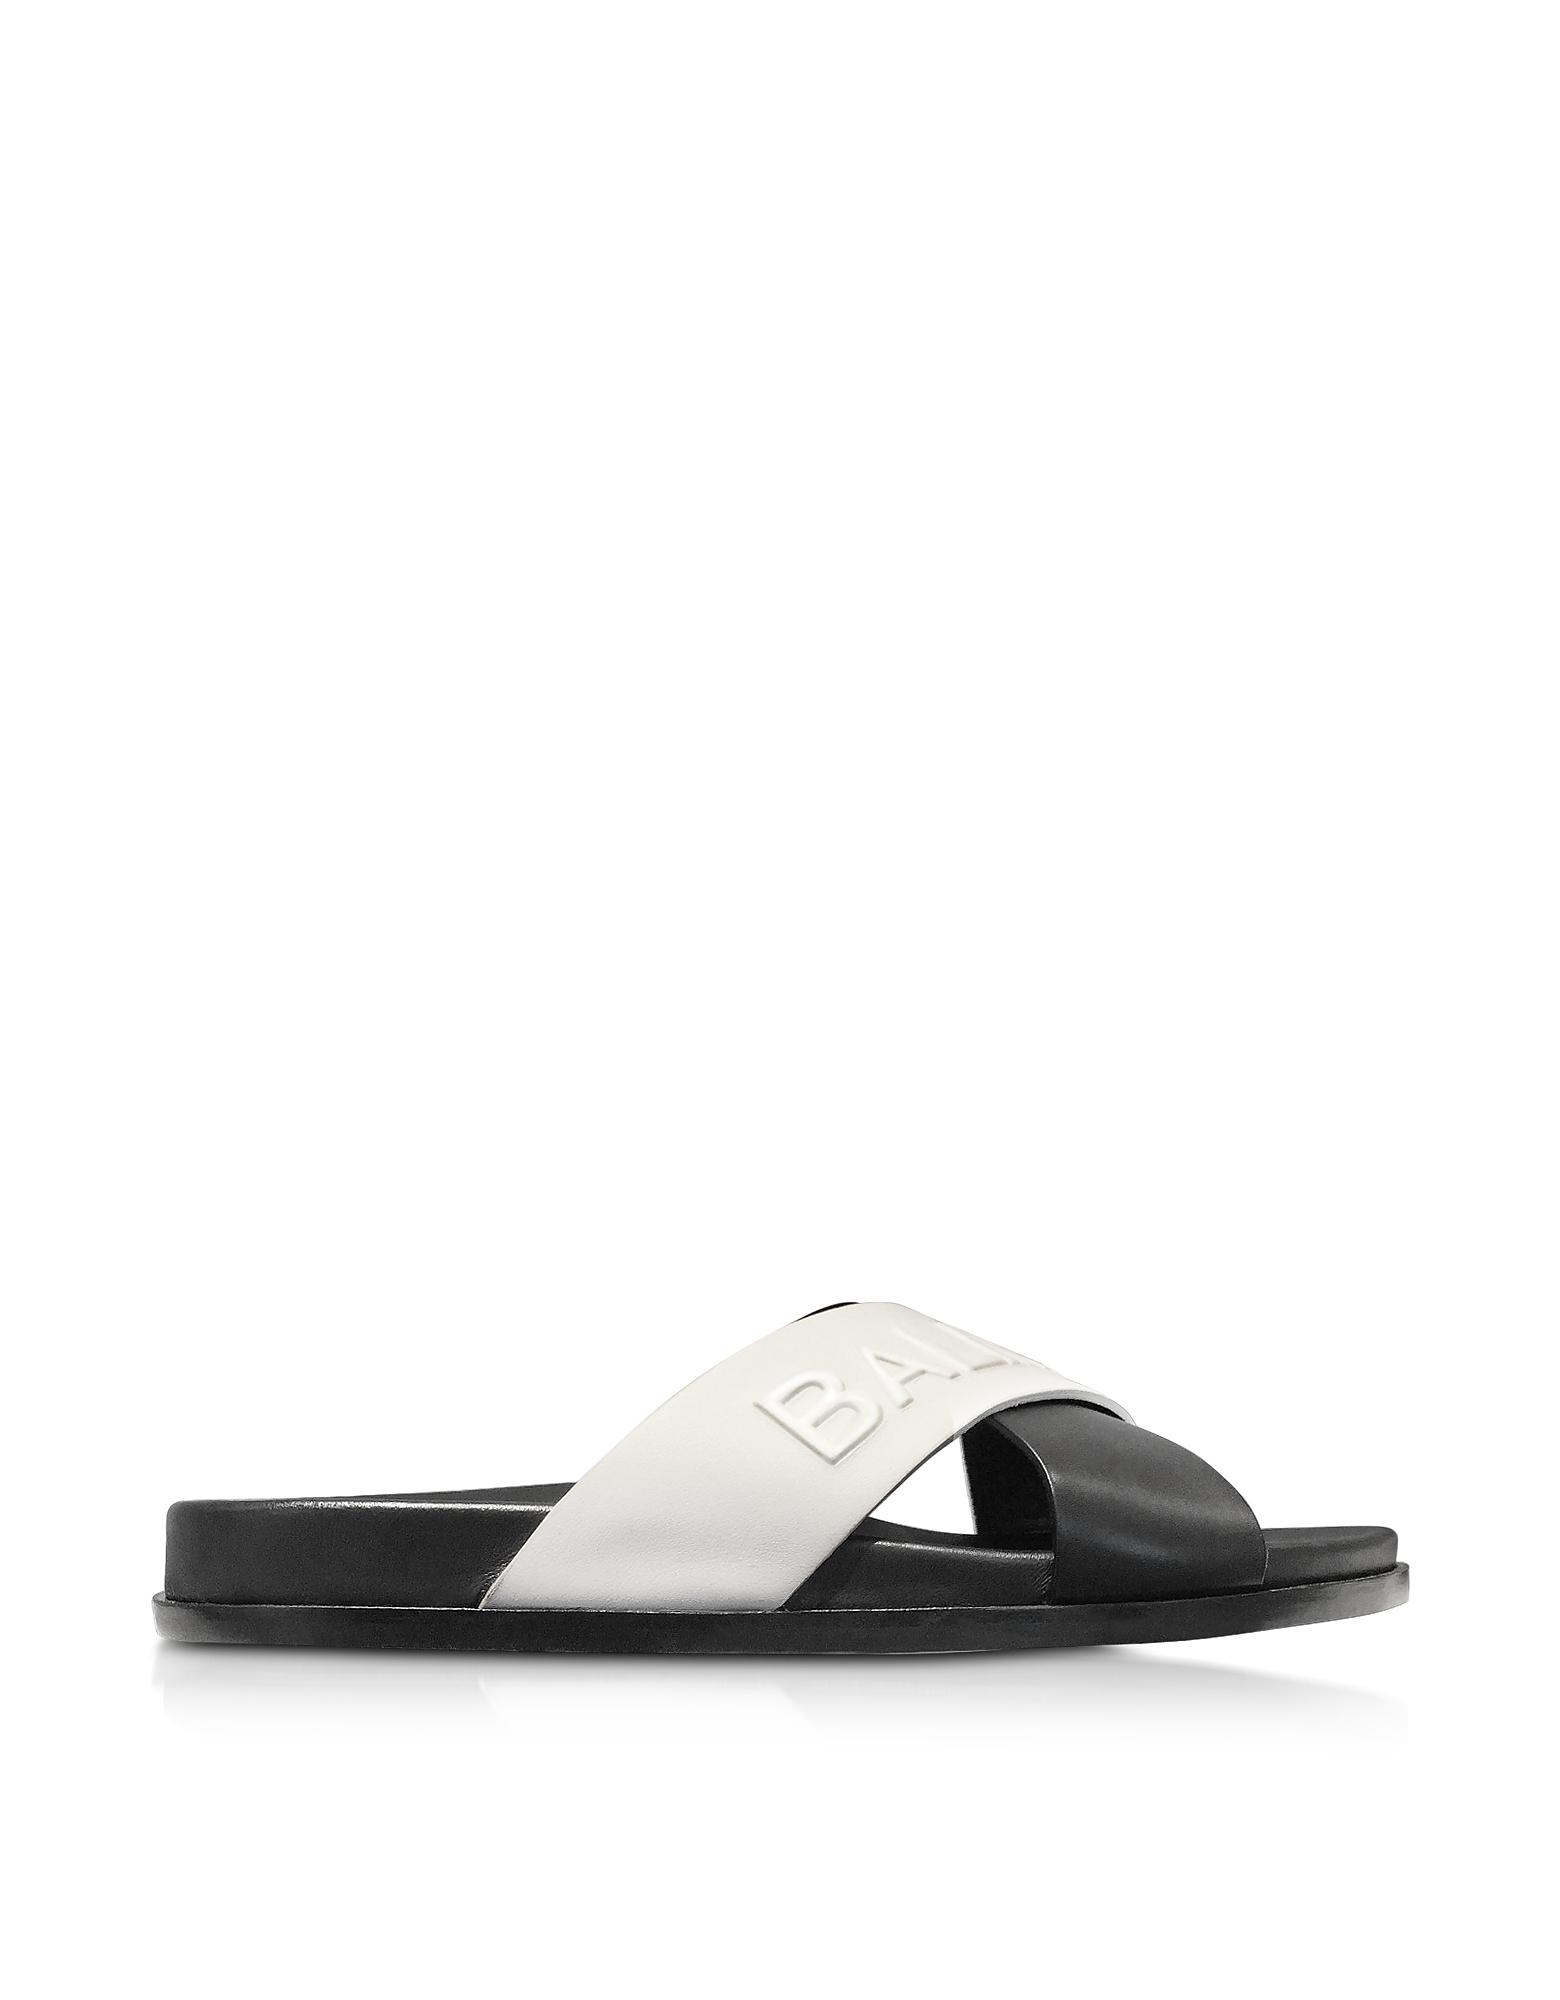 Balmain Shoes, Black & White Leather Criss Cross Women's Slide Sandals